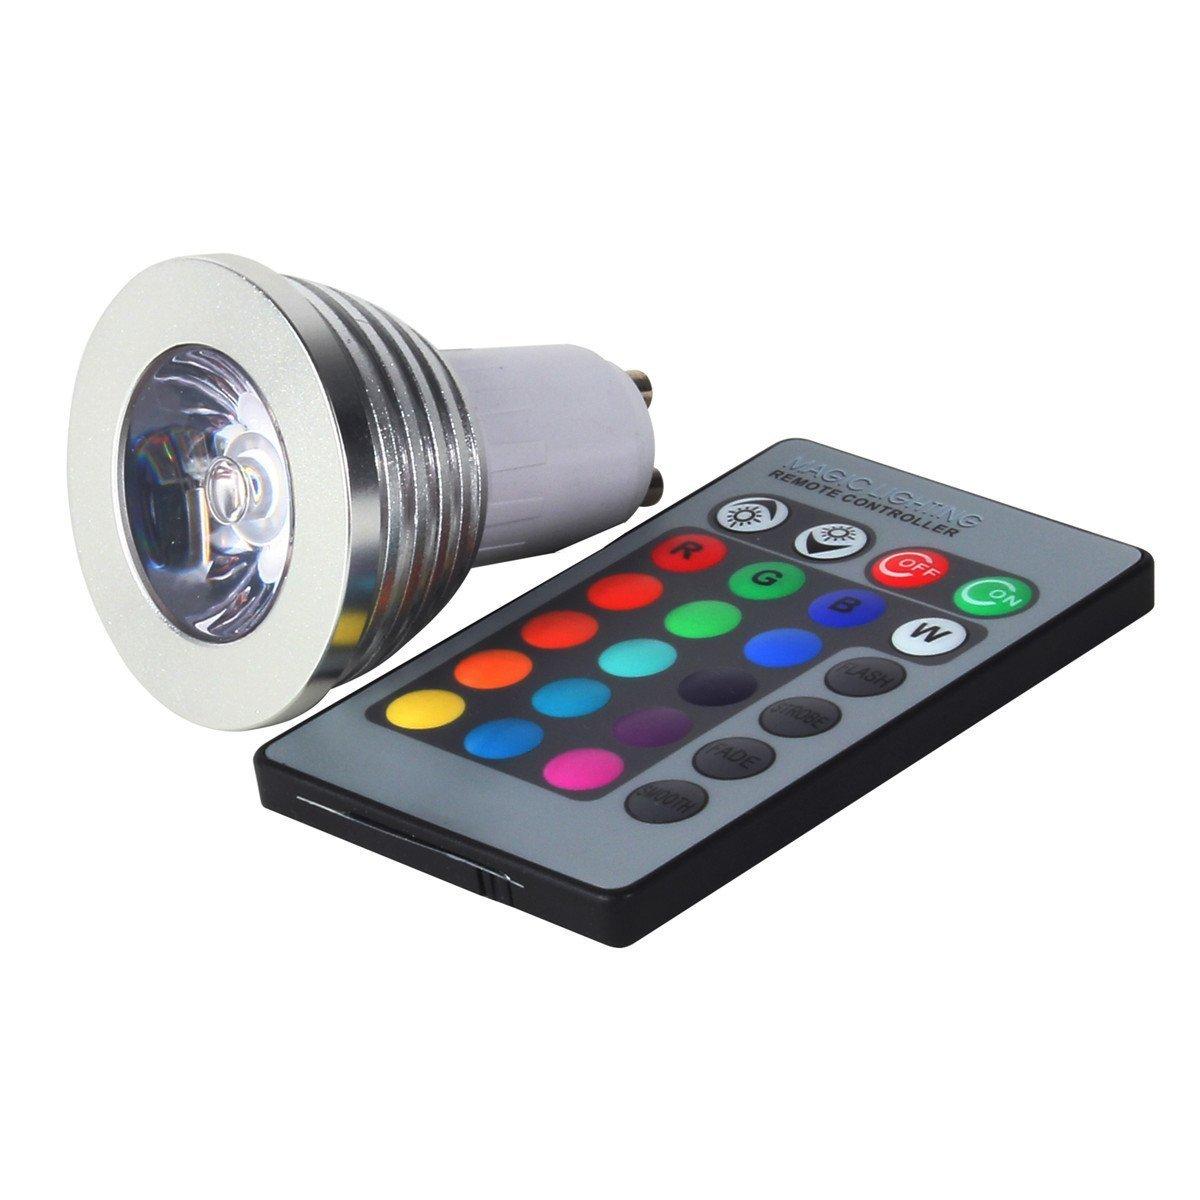 Gu10 multi color led light bulb with remote control gu10 rgb gu10 multi color led light bulb with remote control gu10 rgb amazon kitchen home parisarafo Image collections